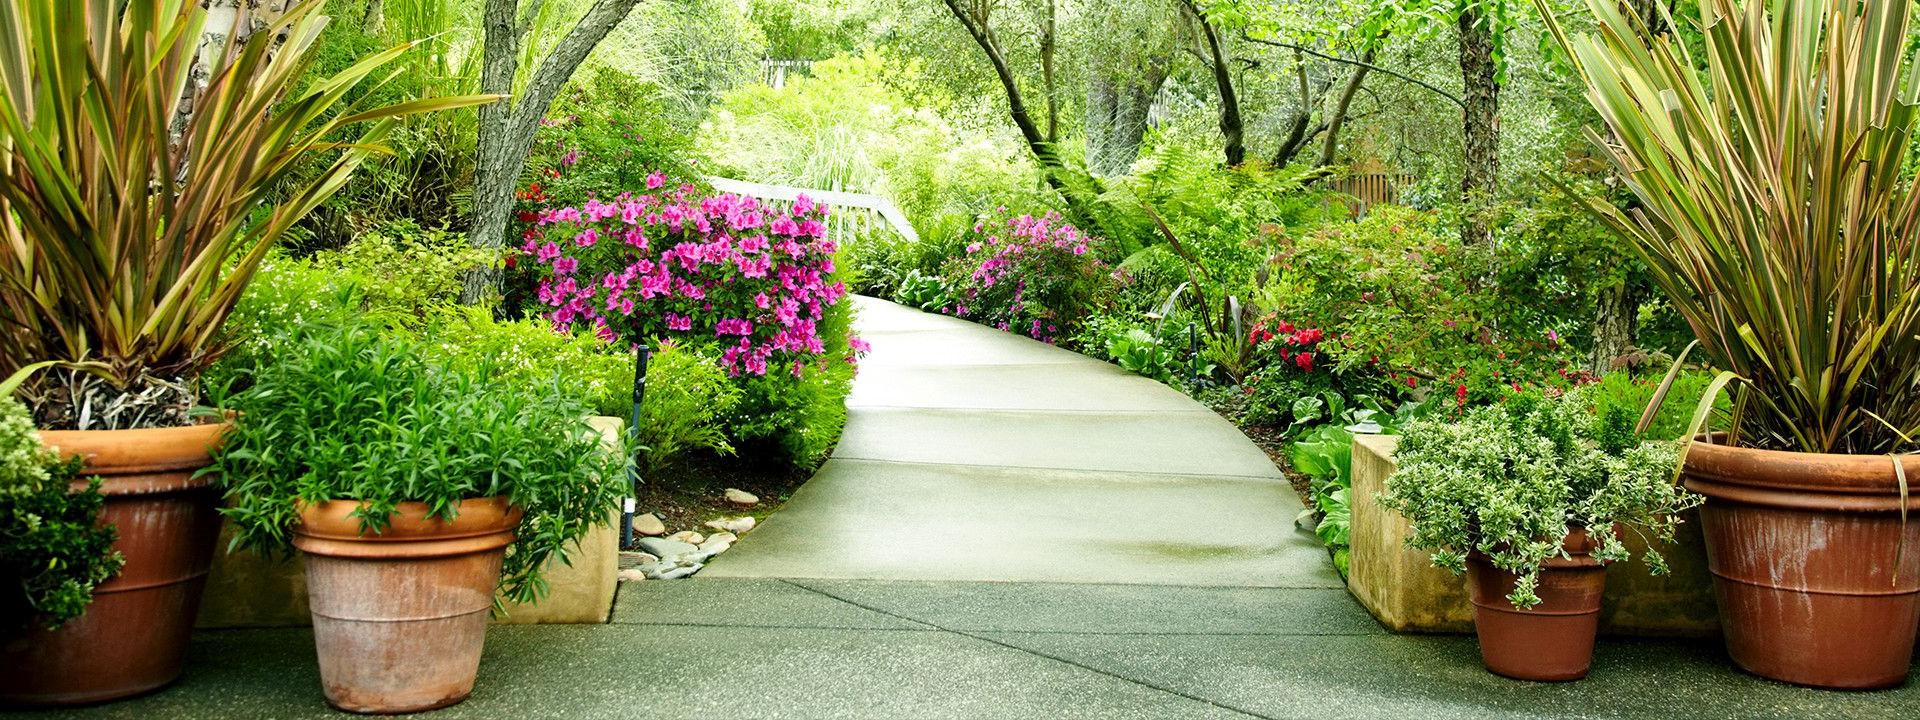 Resources | Brown - Pennington - Atkins Funeral Home